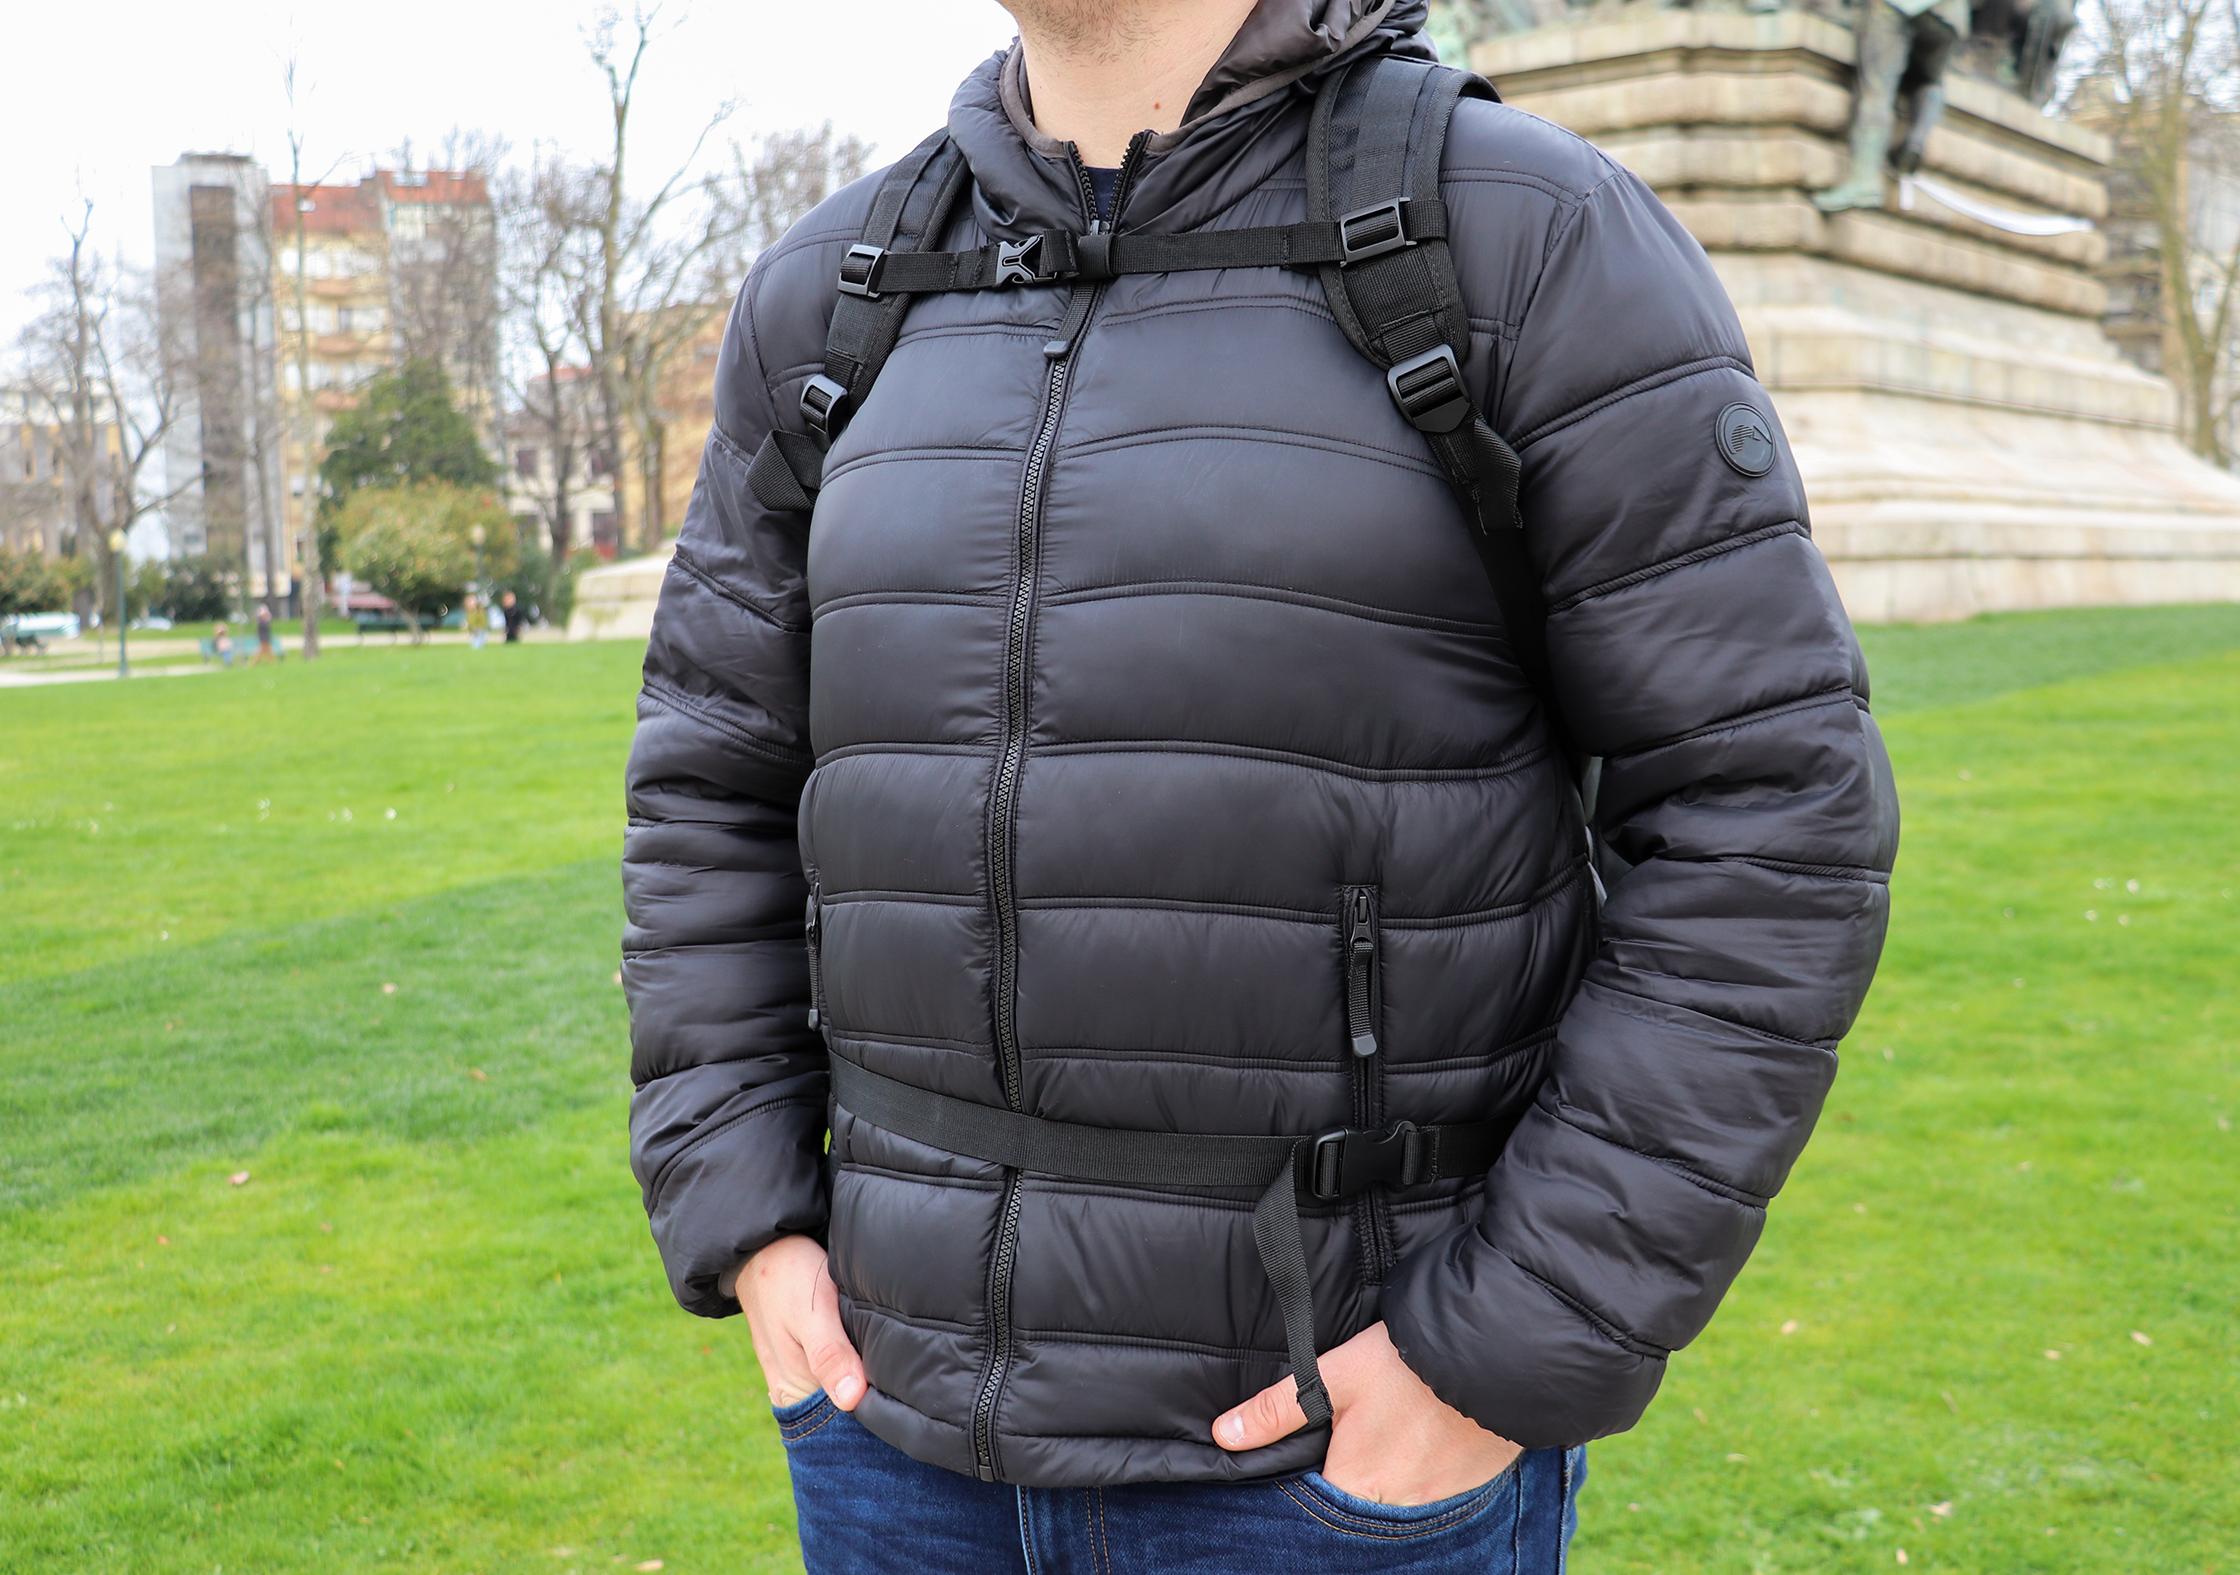 AmazonBasics Carry-On Travel Backpack Sternum Strap & Hip Belt